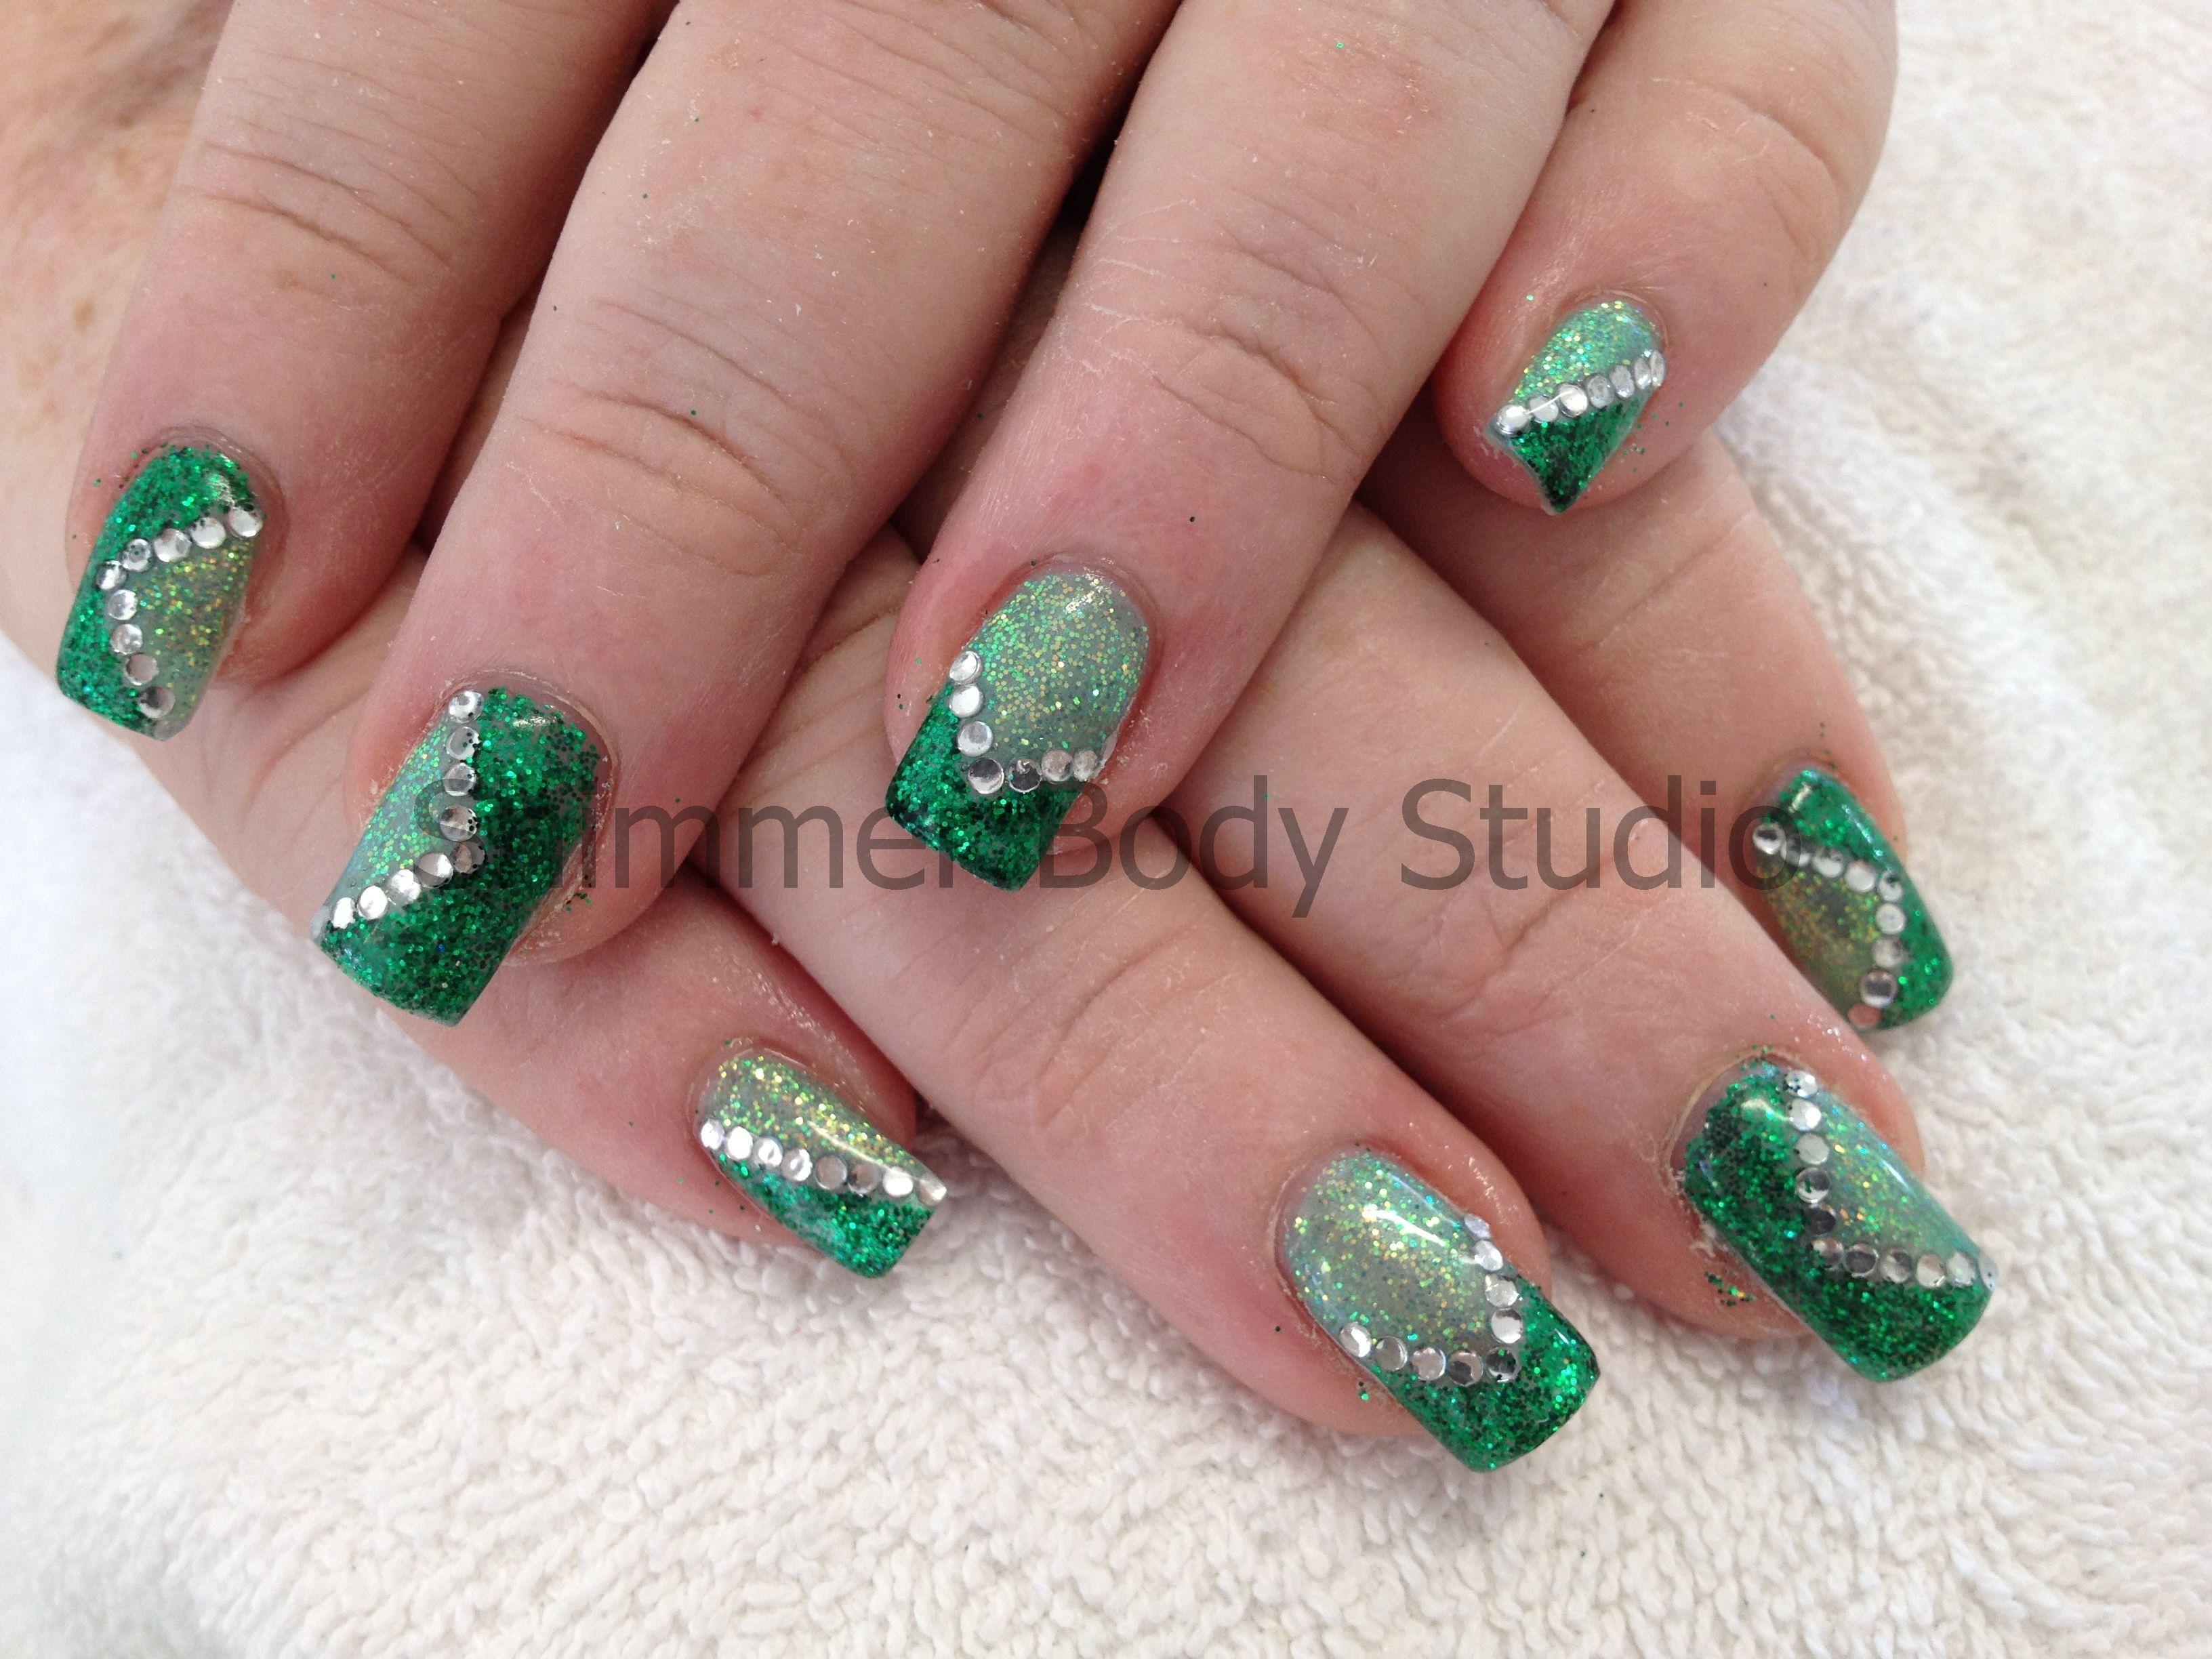 Gel nails, glitter nails, green nails, light green and dark green ...